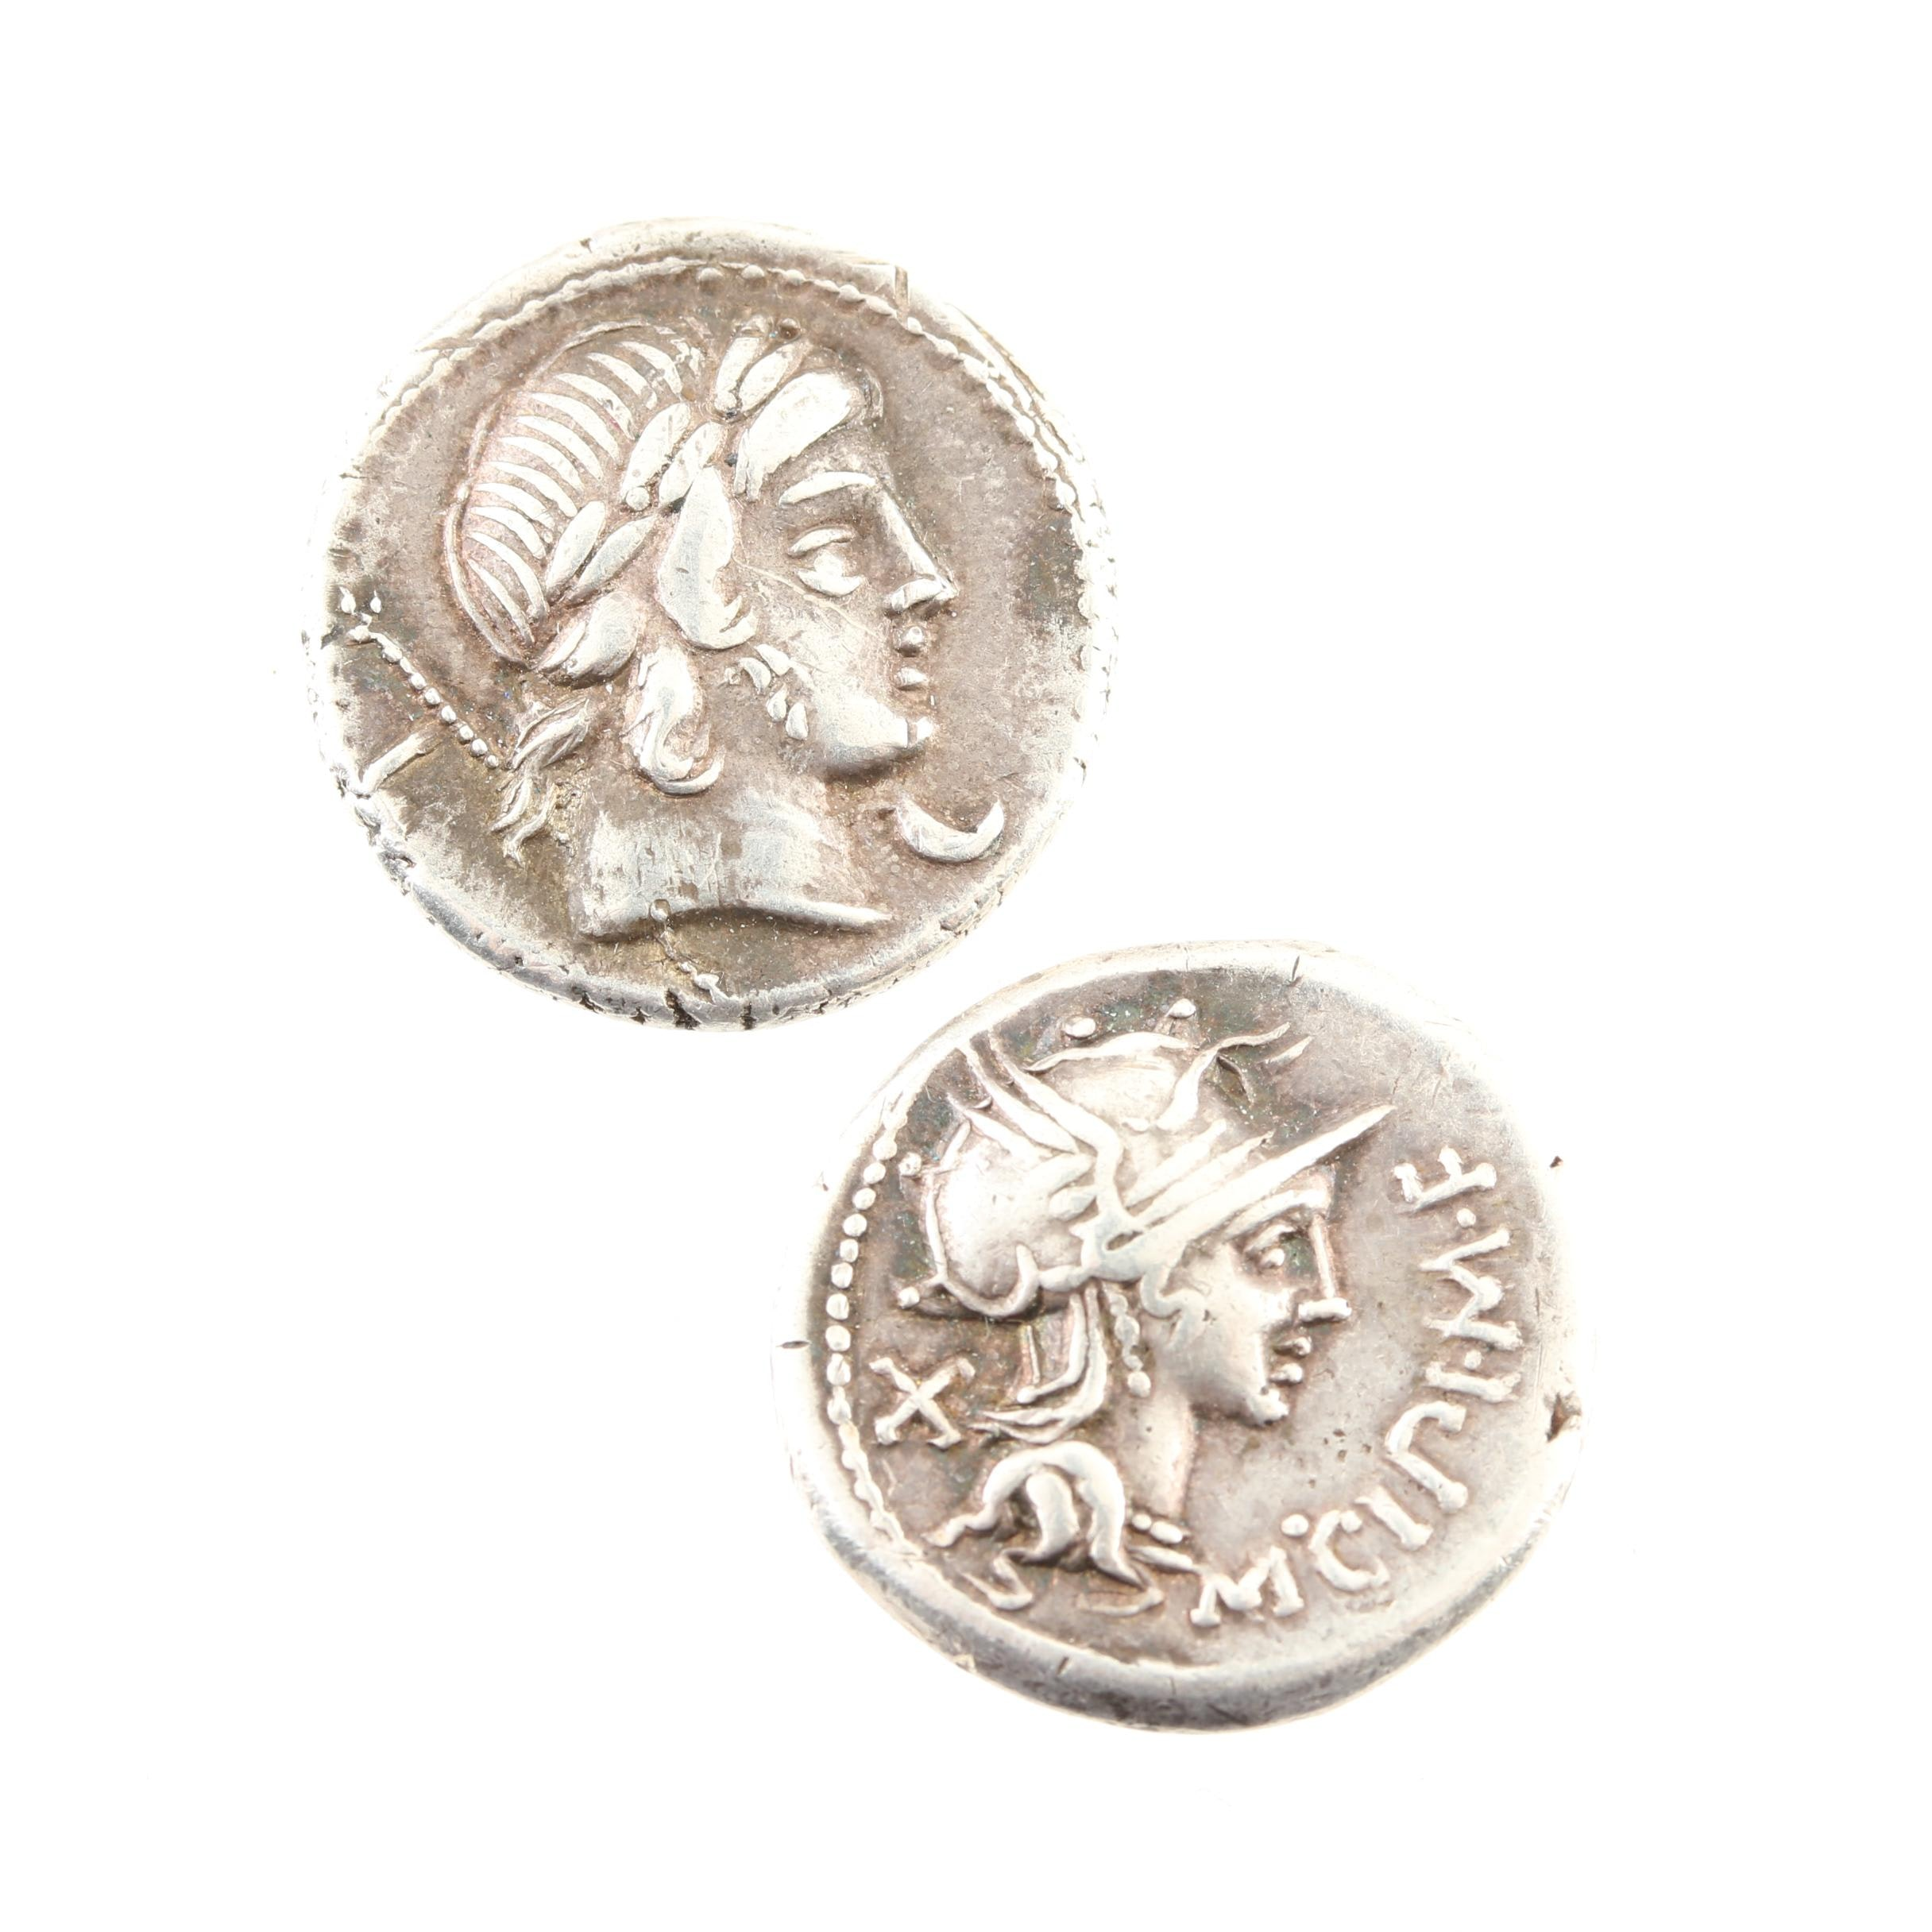 Group of Two Ancient Roman Republic Silver Denarius Coins